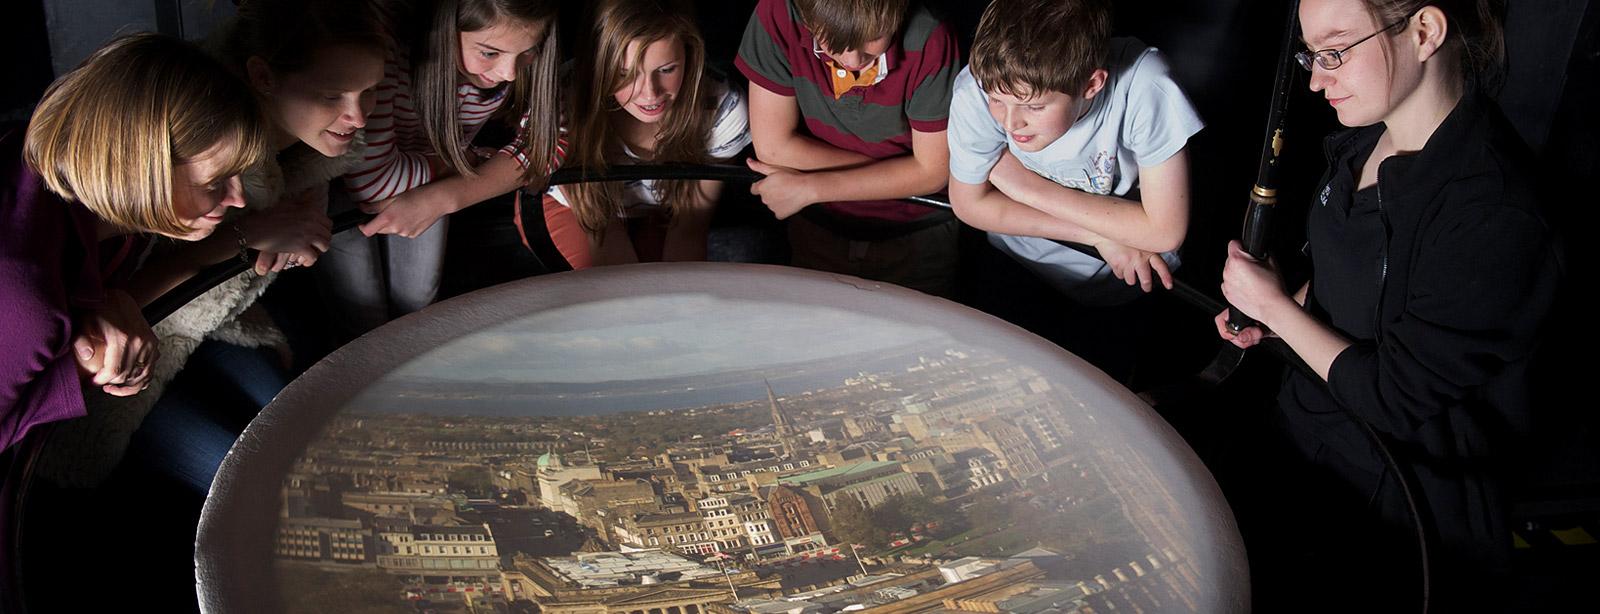 Camera Obscura and World of Illusions - Camera Obscura Show